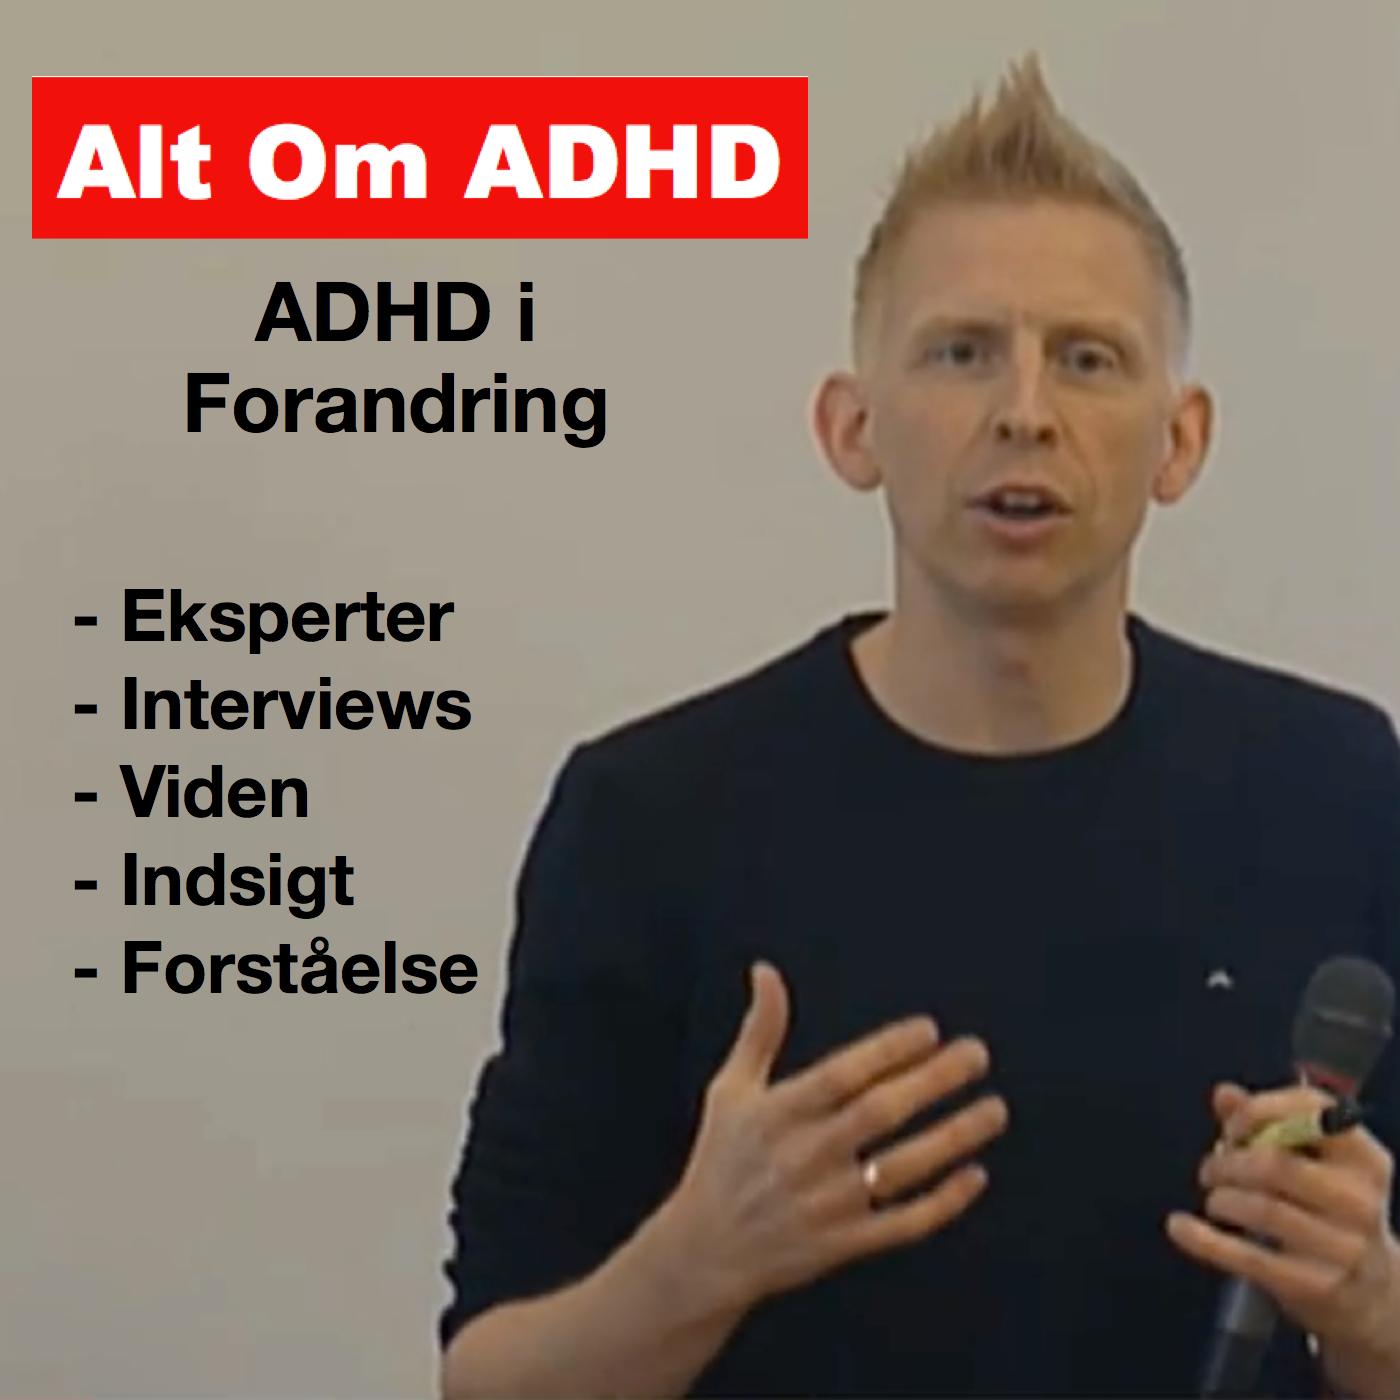 Alt Om ADHDs Podcast - ADHD I Forandring